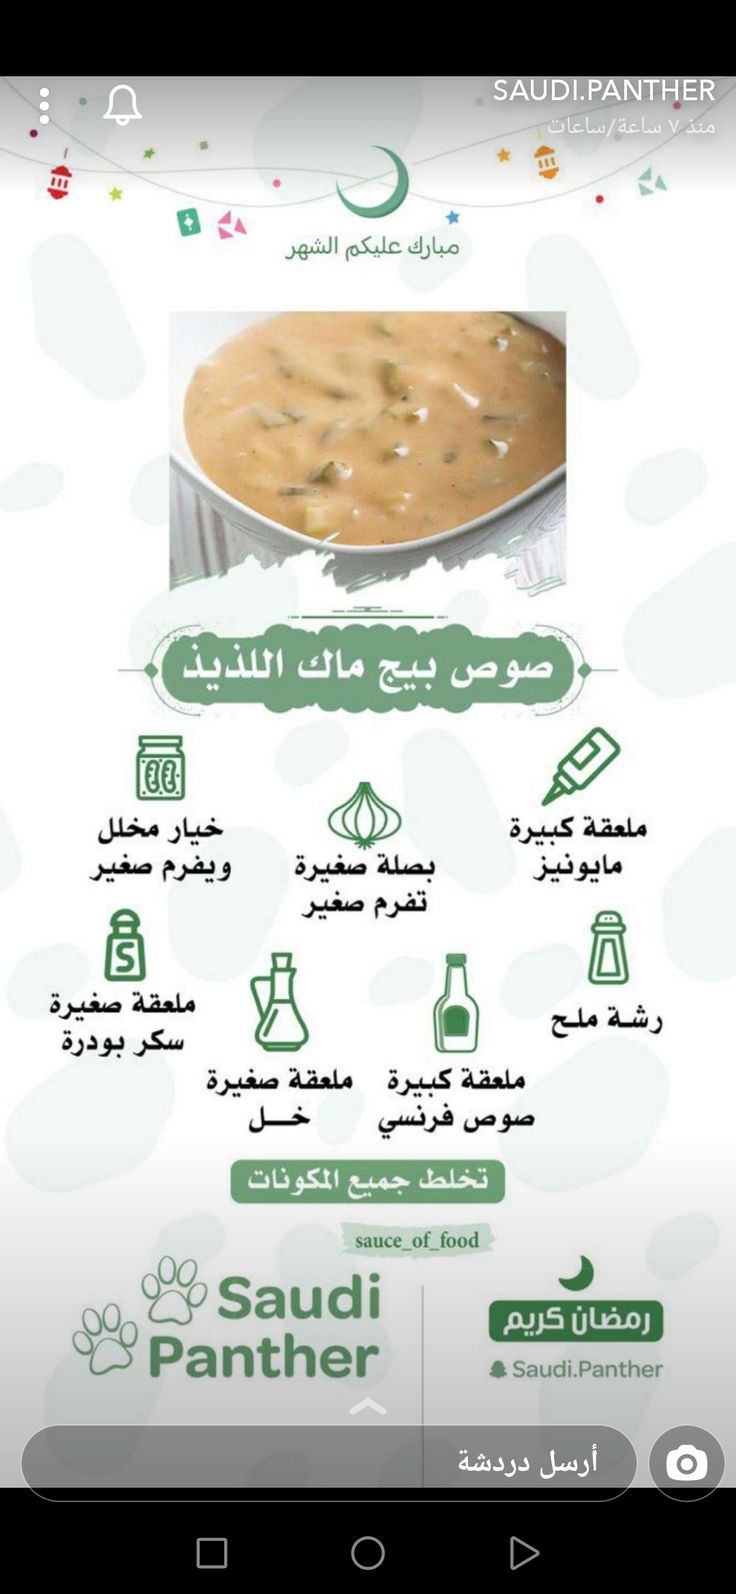 Pin By Sana Azhary On طبخات وضيافة عربية وعالمية Food Recipies Food Recipes